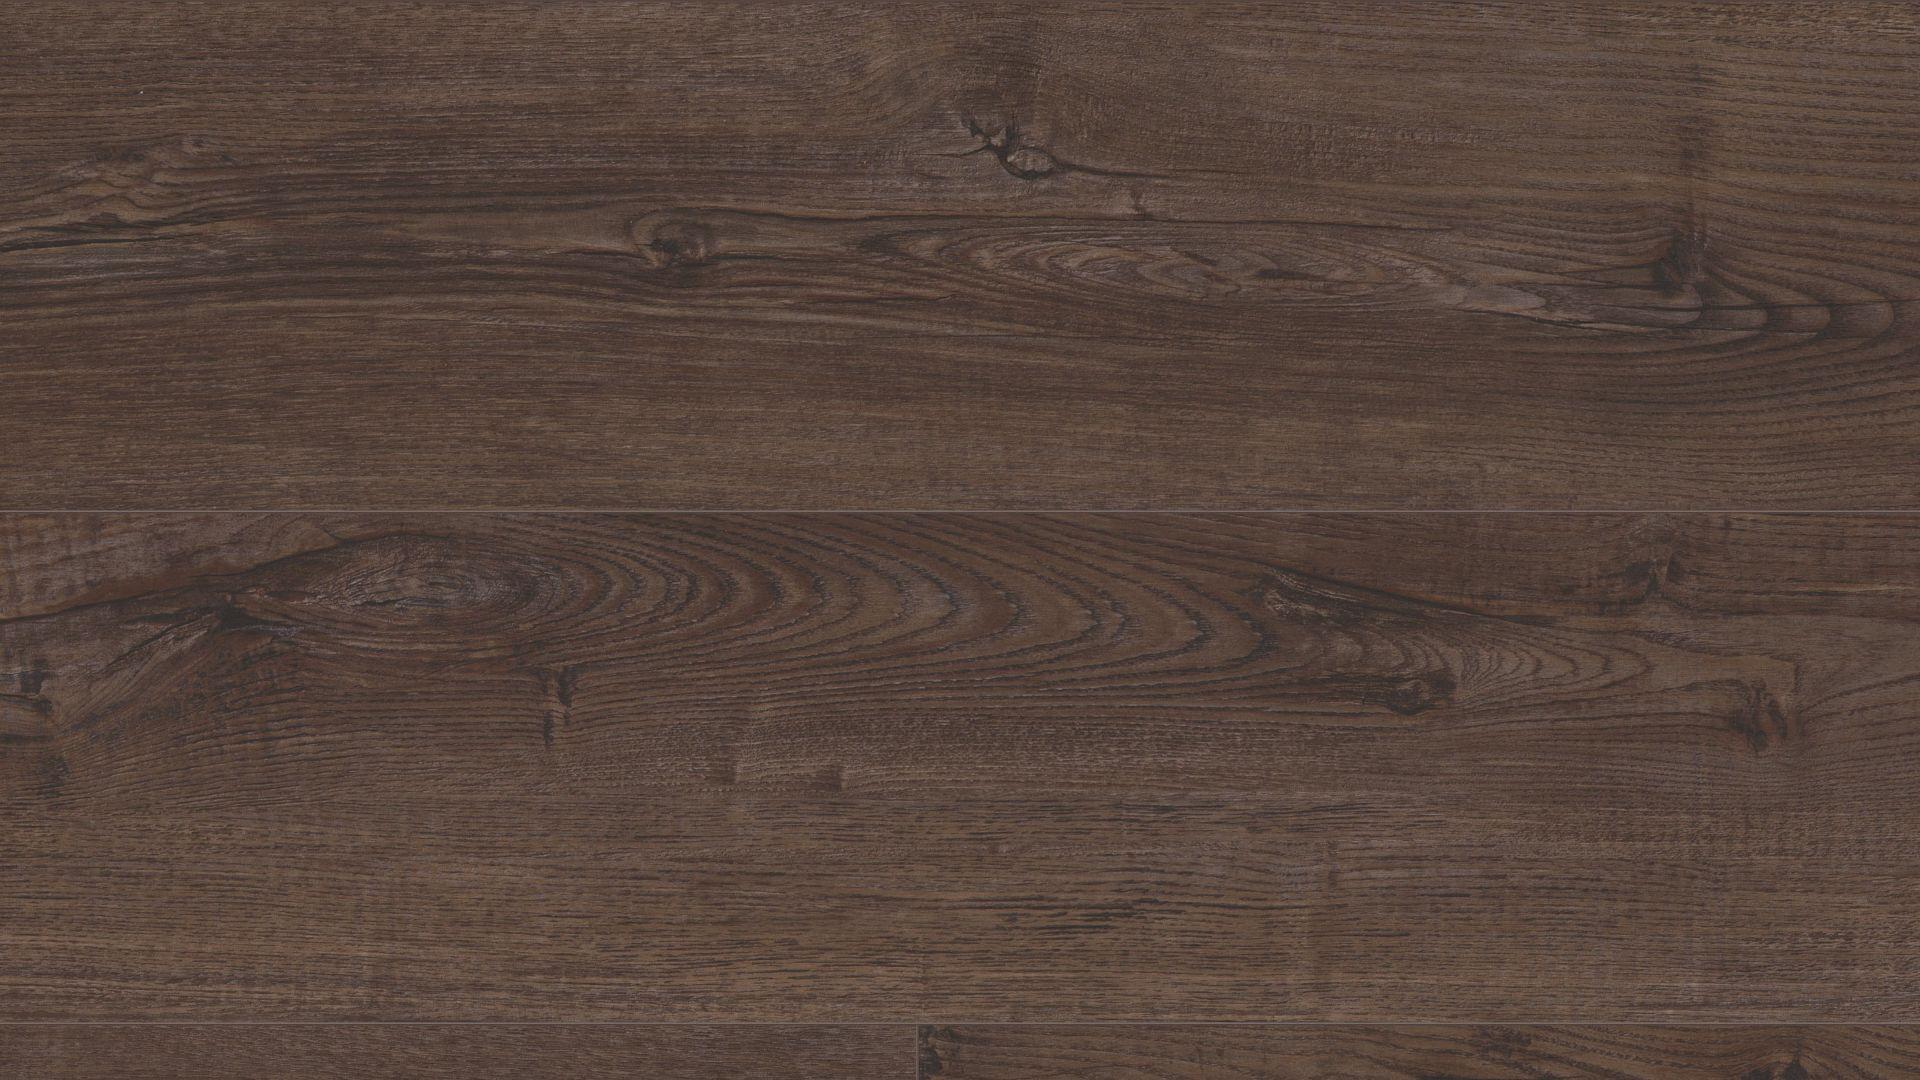 SMOKED RUSTIC PINE EVP Vinyl Flooring Product Shot